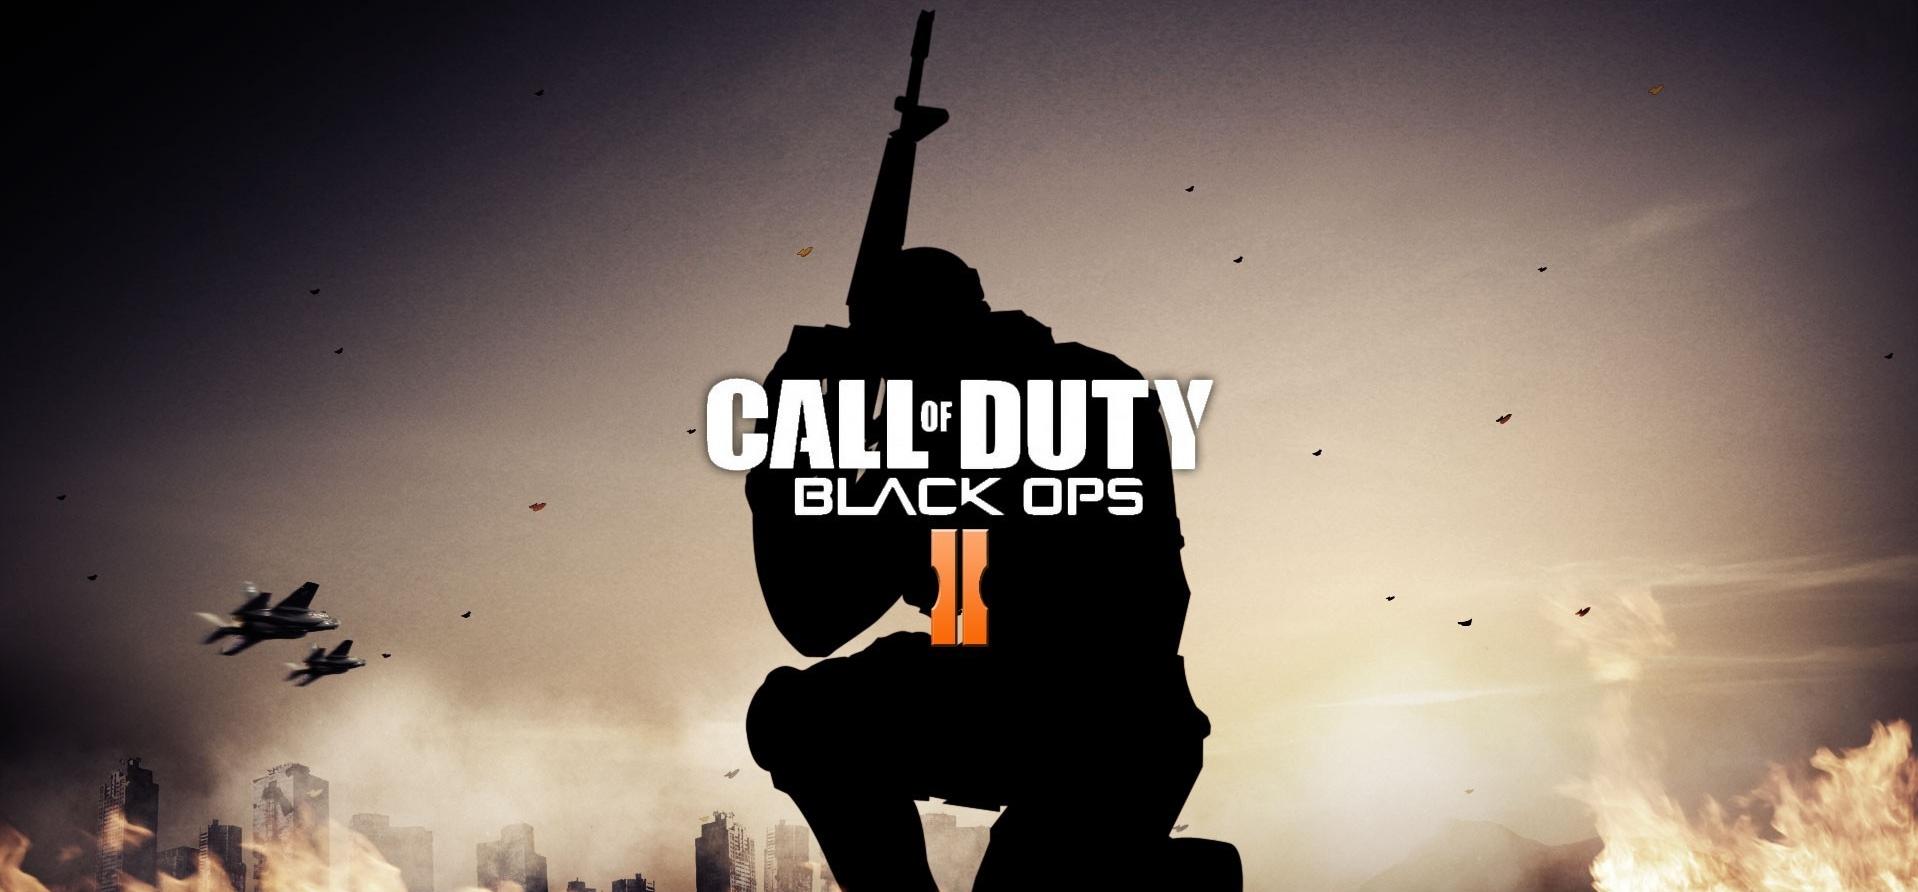 Call Of Duty Black Ops 2 Wallpaper 19 Wallpapersbq